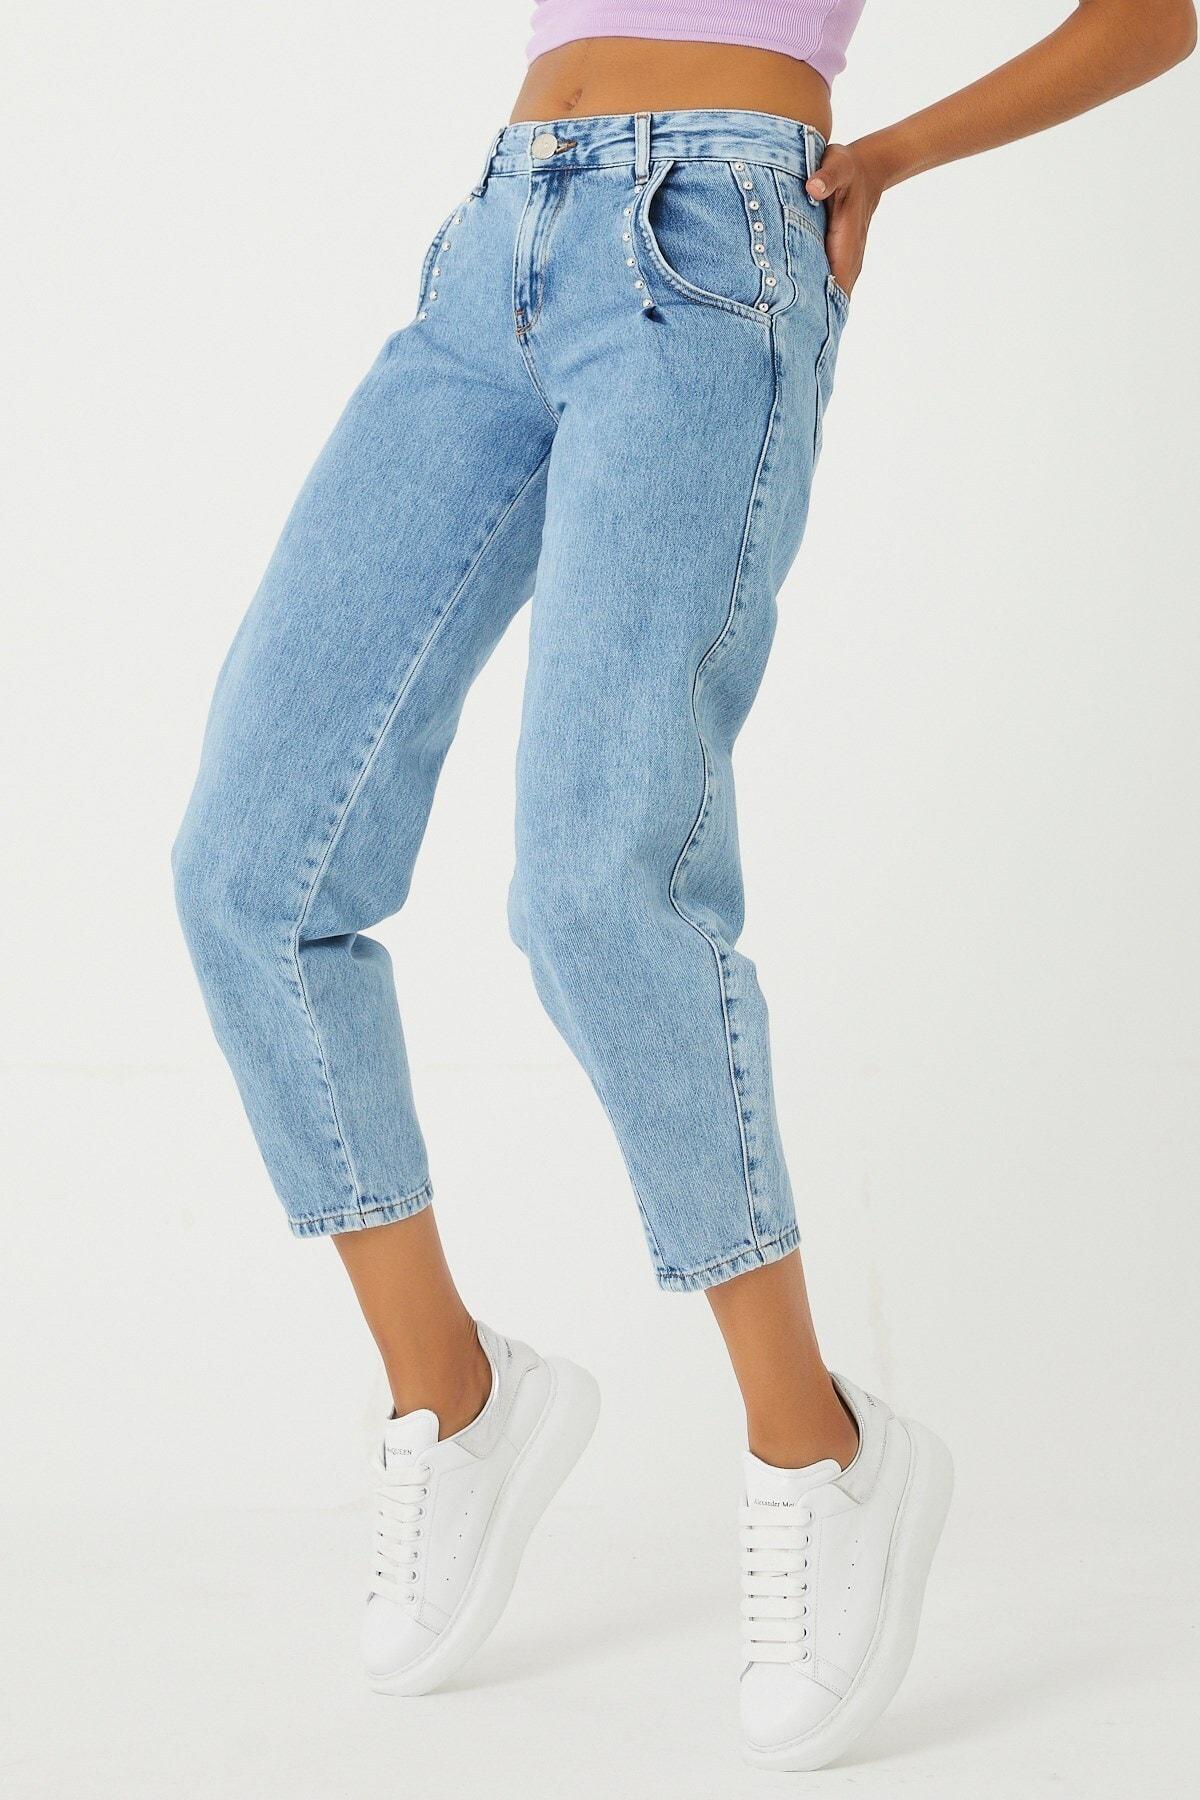 A.M.N Denim Normal Bel Trok Detaylı Paça Lastikli Boy Friend Denim Pantolon 2